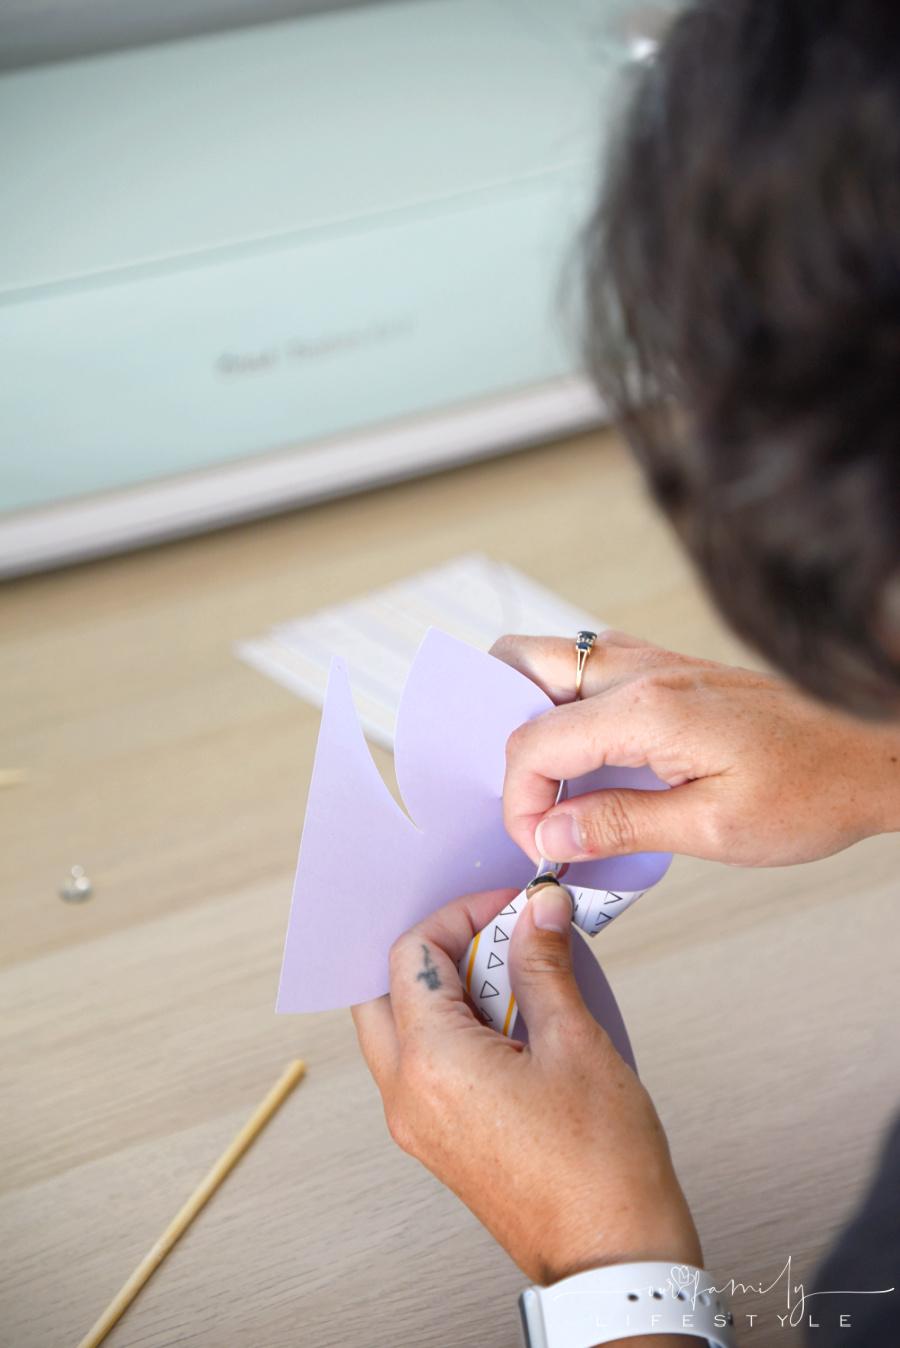 putting together a paper pinwheel